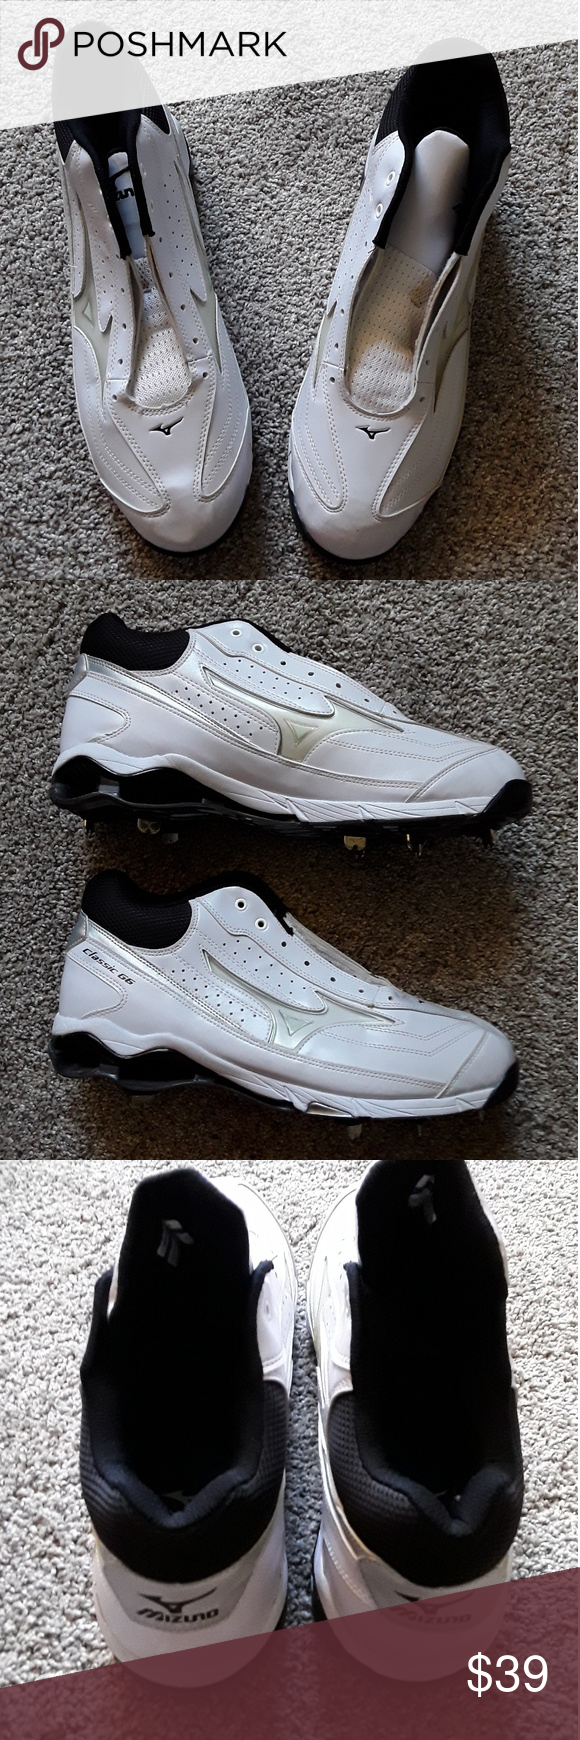 Mizuno Baseball Cleats Shoes Size 14 New Nwt Cleats Shoes Mizuno Shoes Baseball Cleats